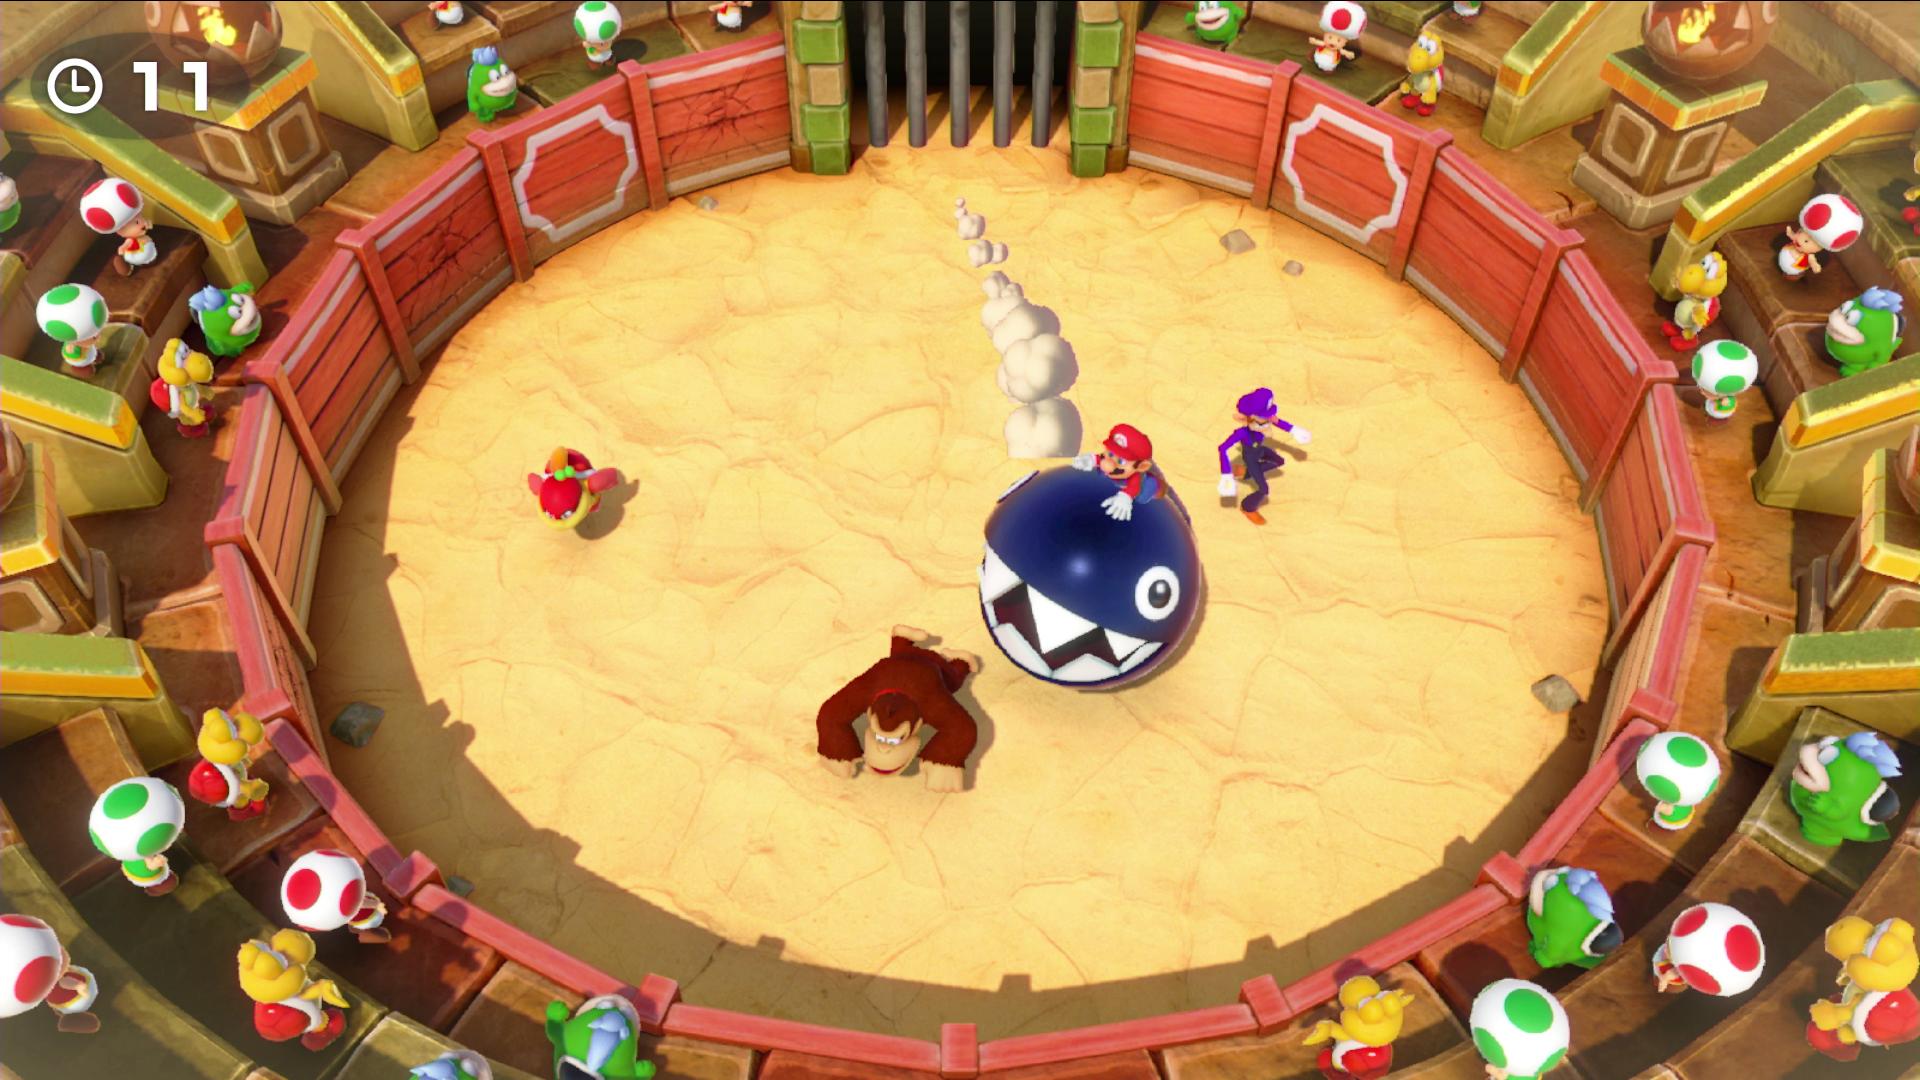 Super Smash Bros. Ultimate adds Isabelle